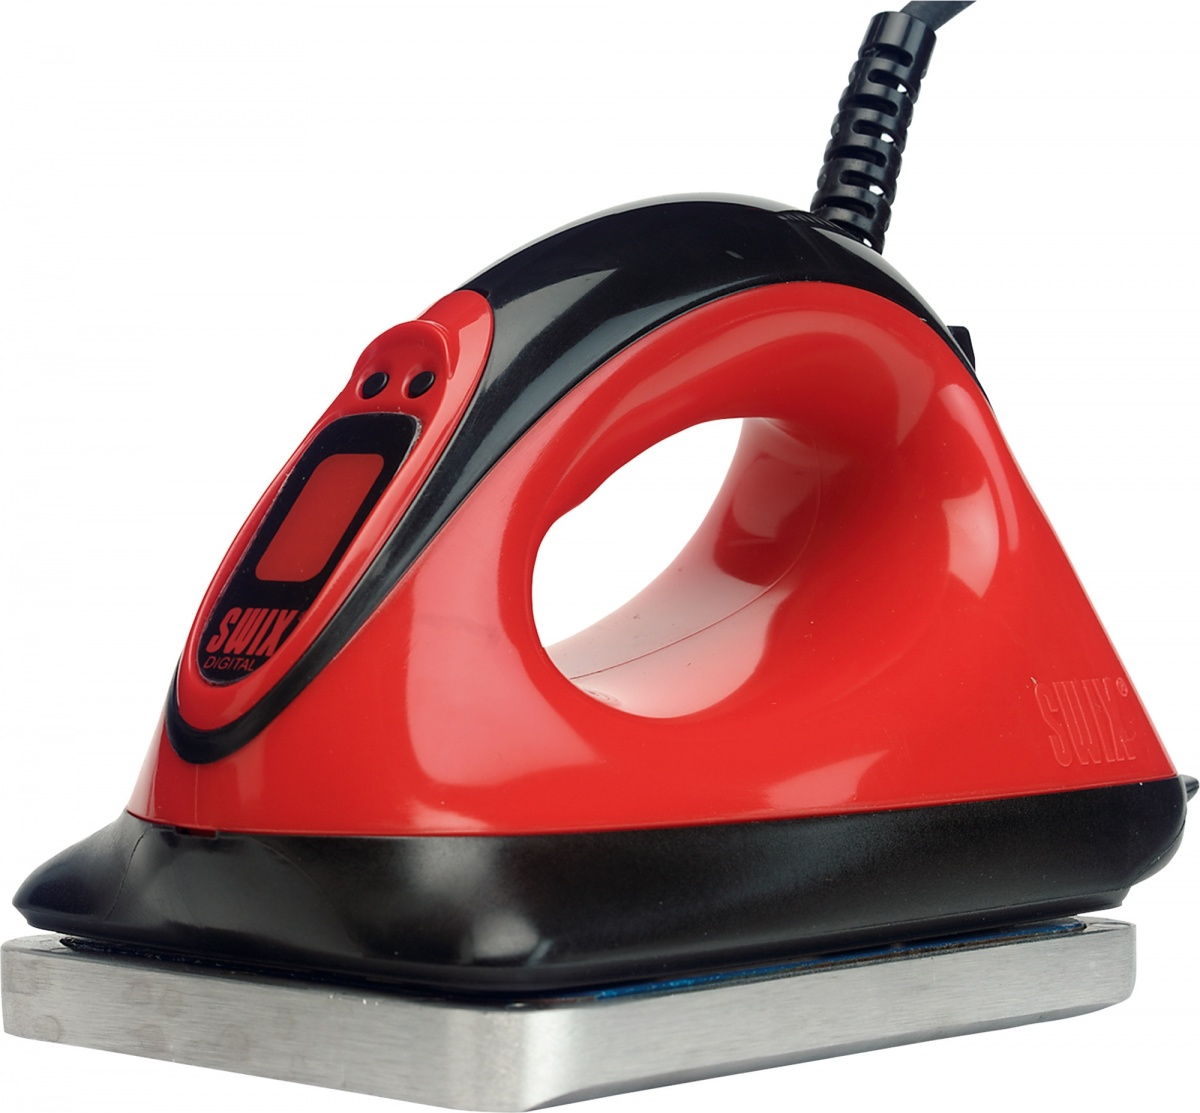 Swix Swix T72 Racing Digital Waxing Iron